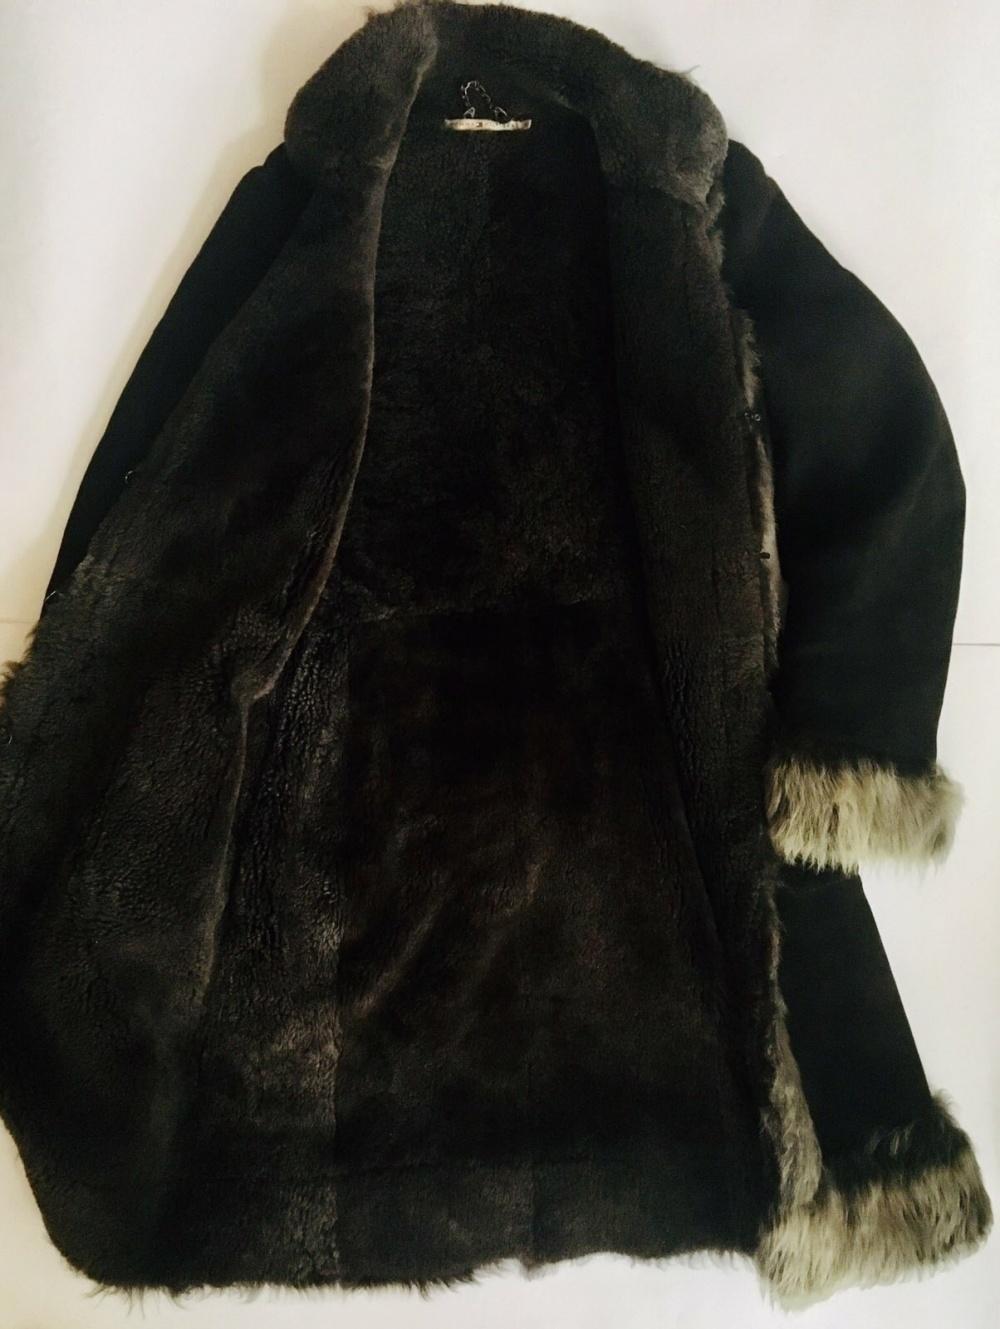 Дубленка Tommy Hilfiger, размер 40-42